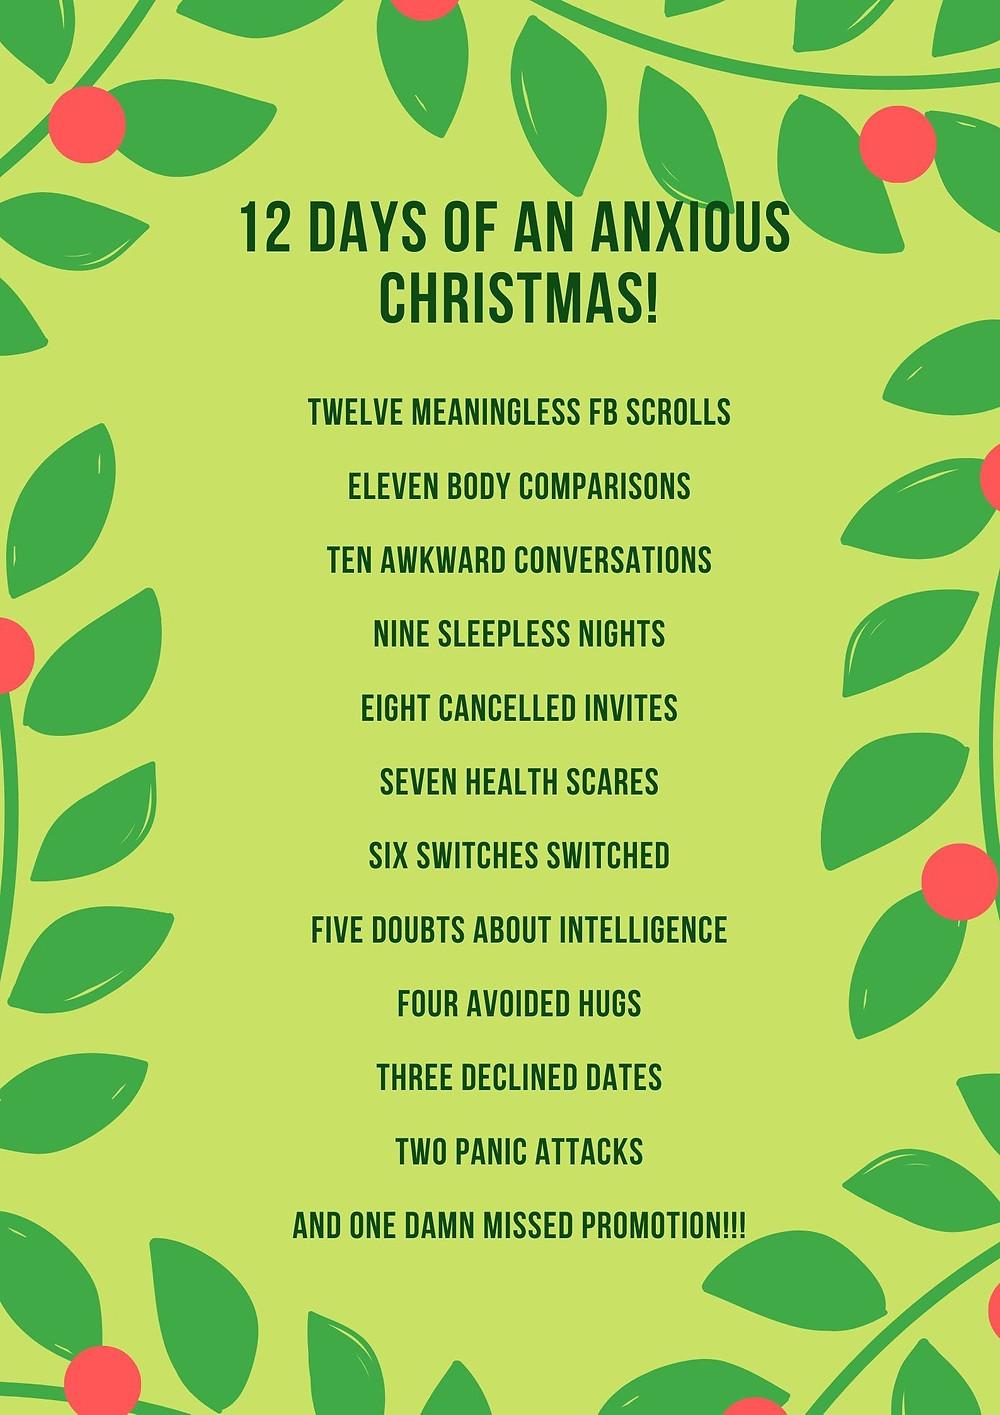 12 Days of an Anxious Xmas